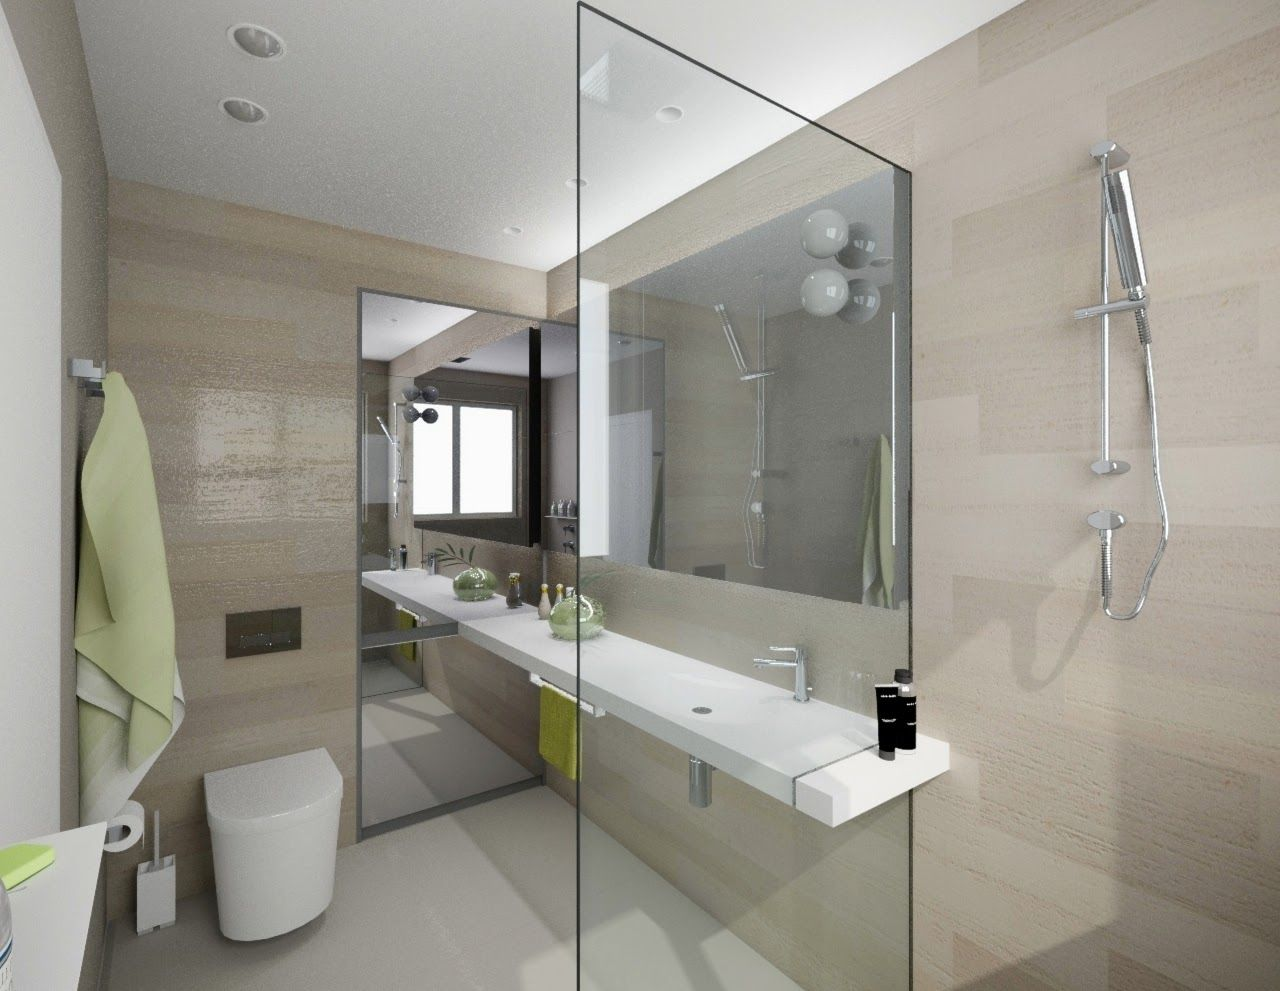 2016 interior design bathroom floor trends google search - Small Bathroom Designs Australia